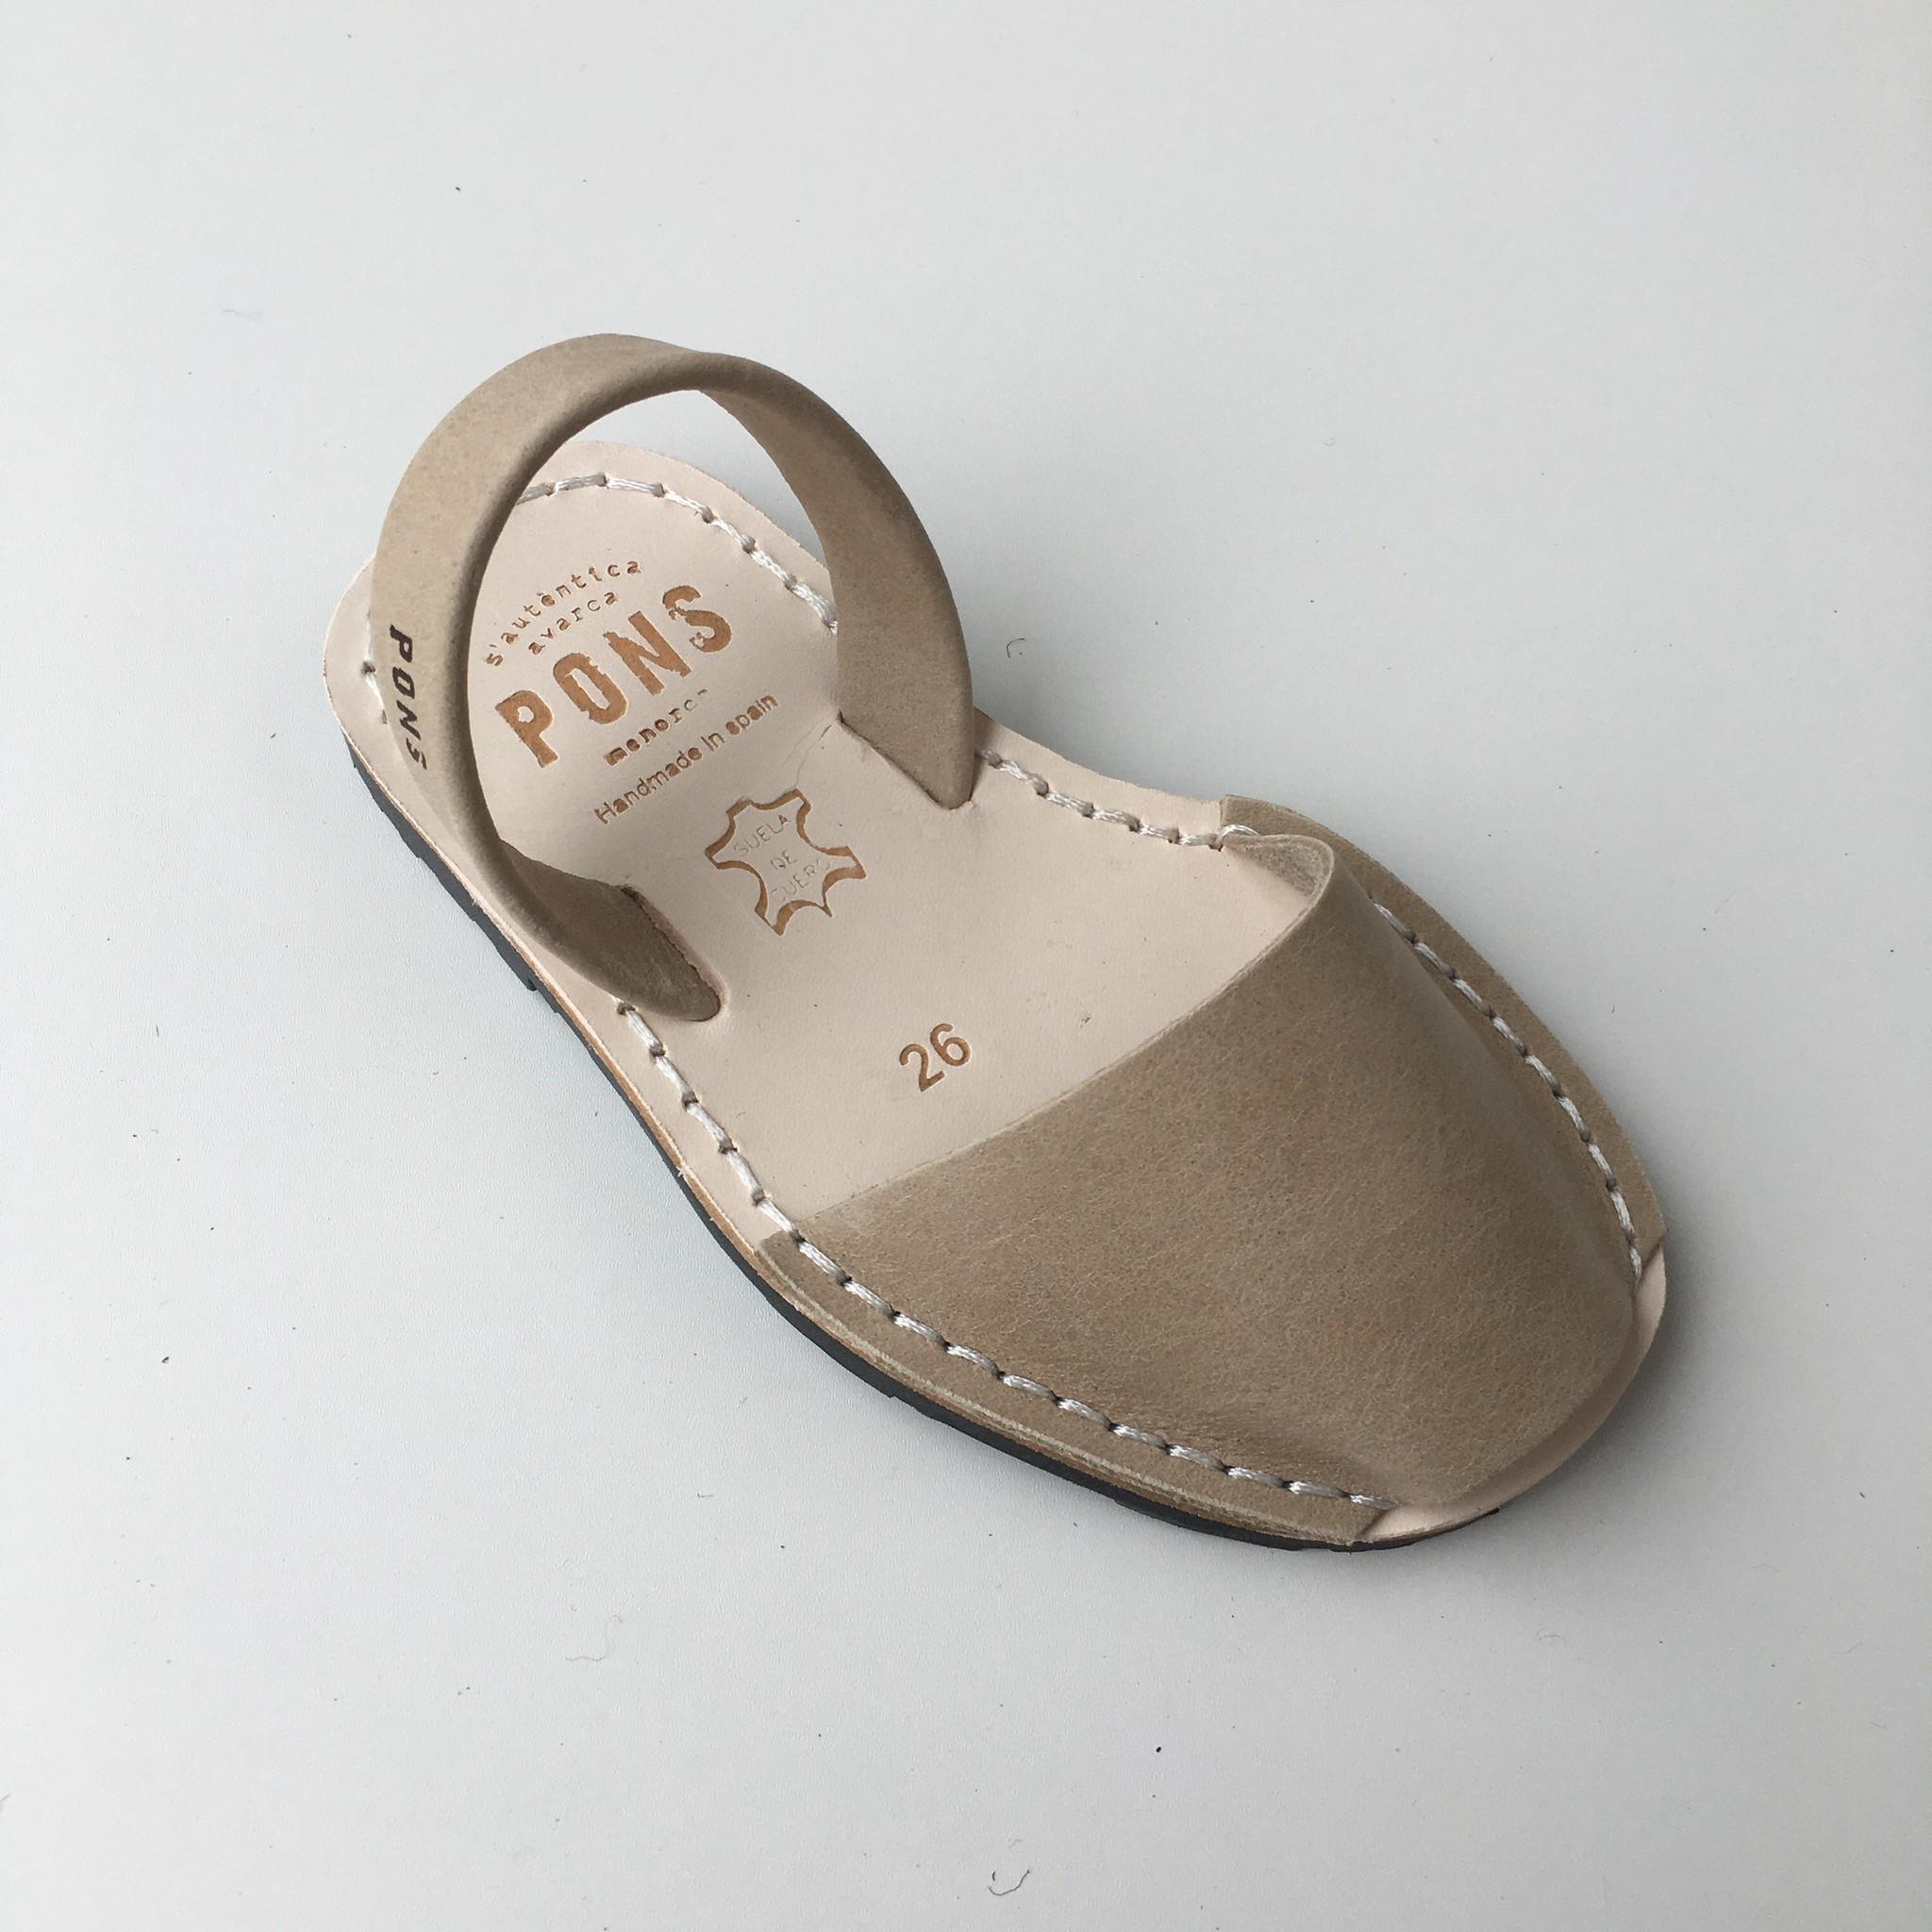 Pons  leren avarca sandaal kind DUNA - zandkleur beige - 26 tm 34